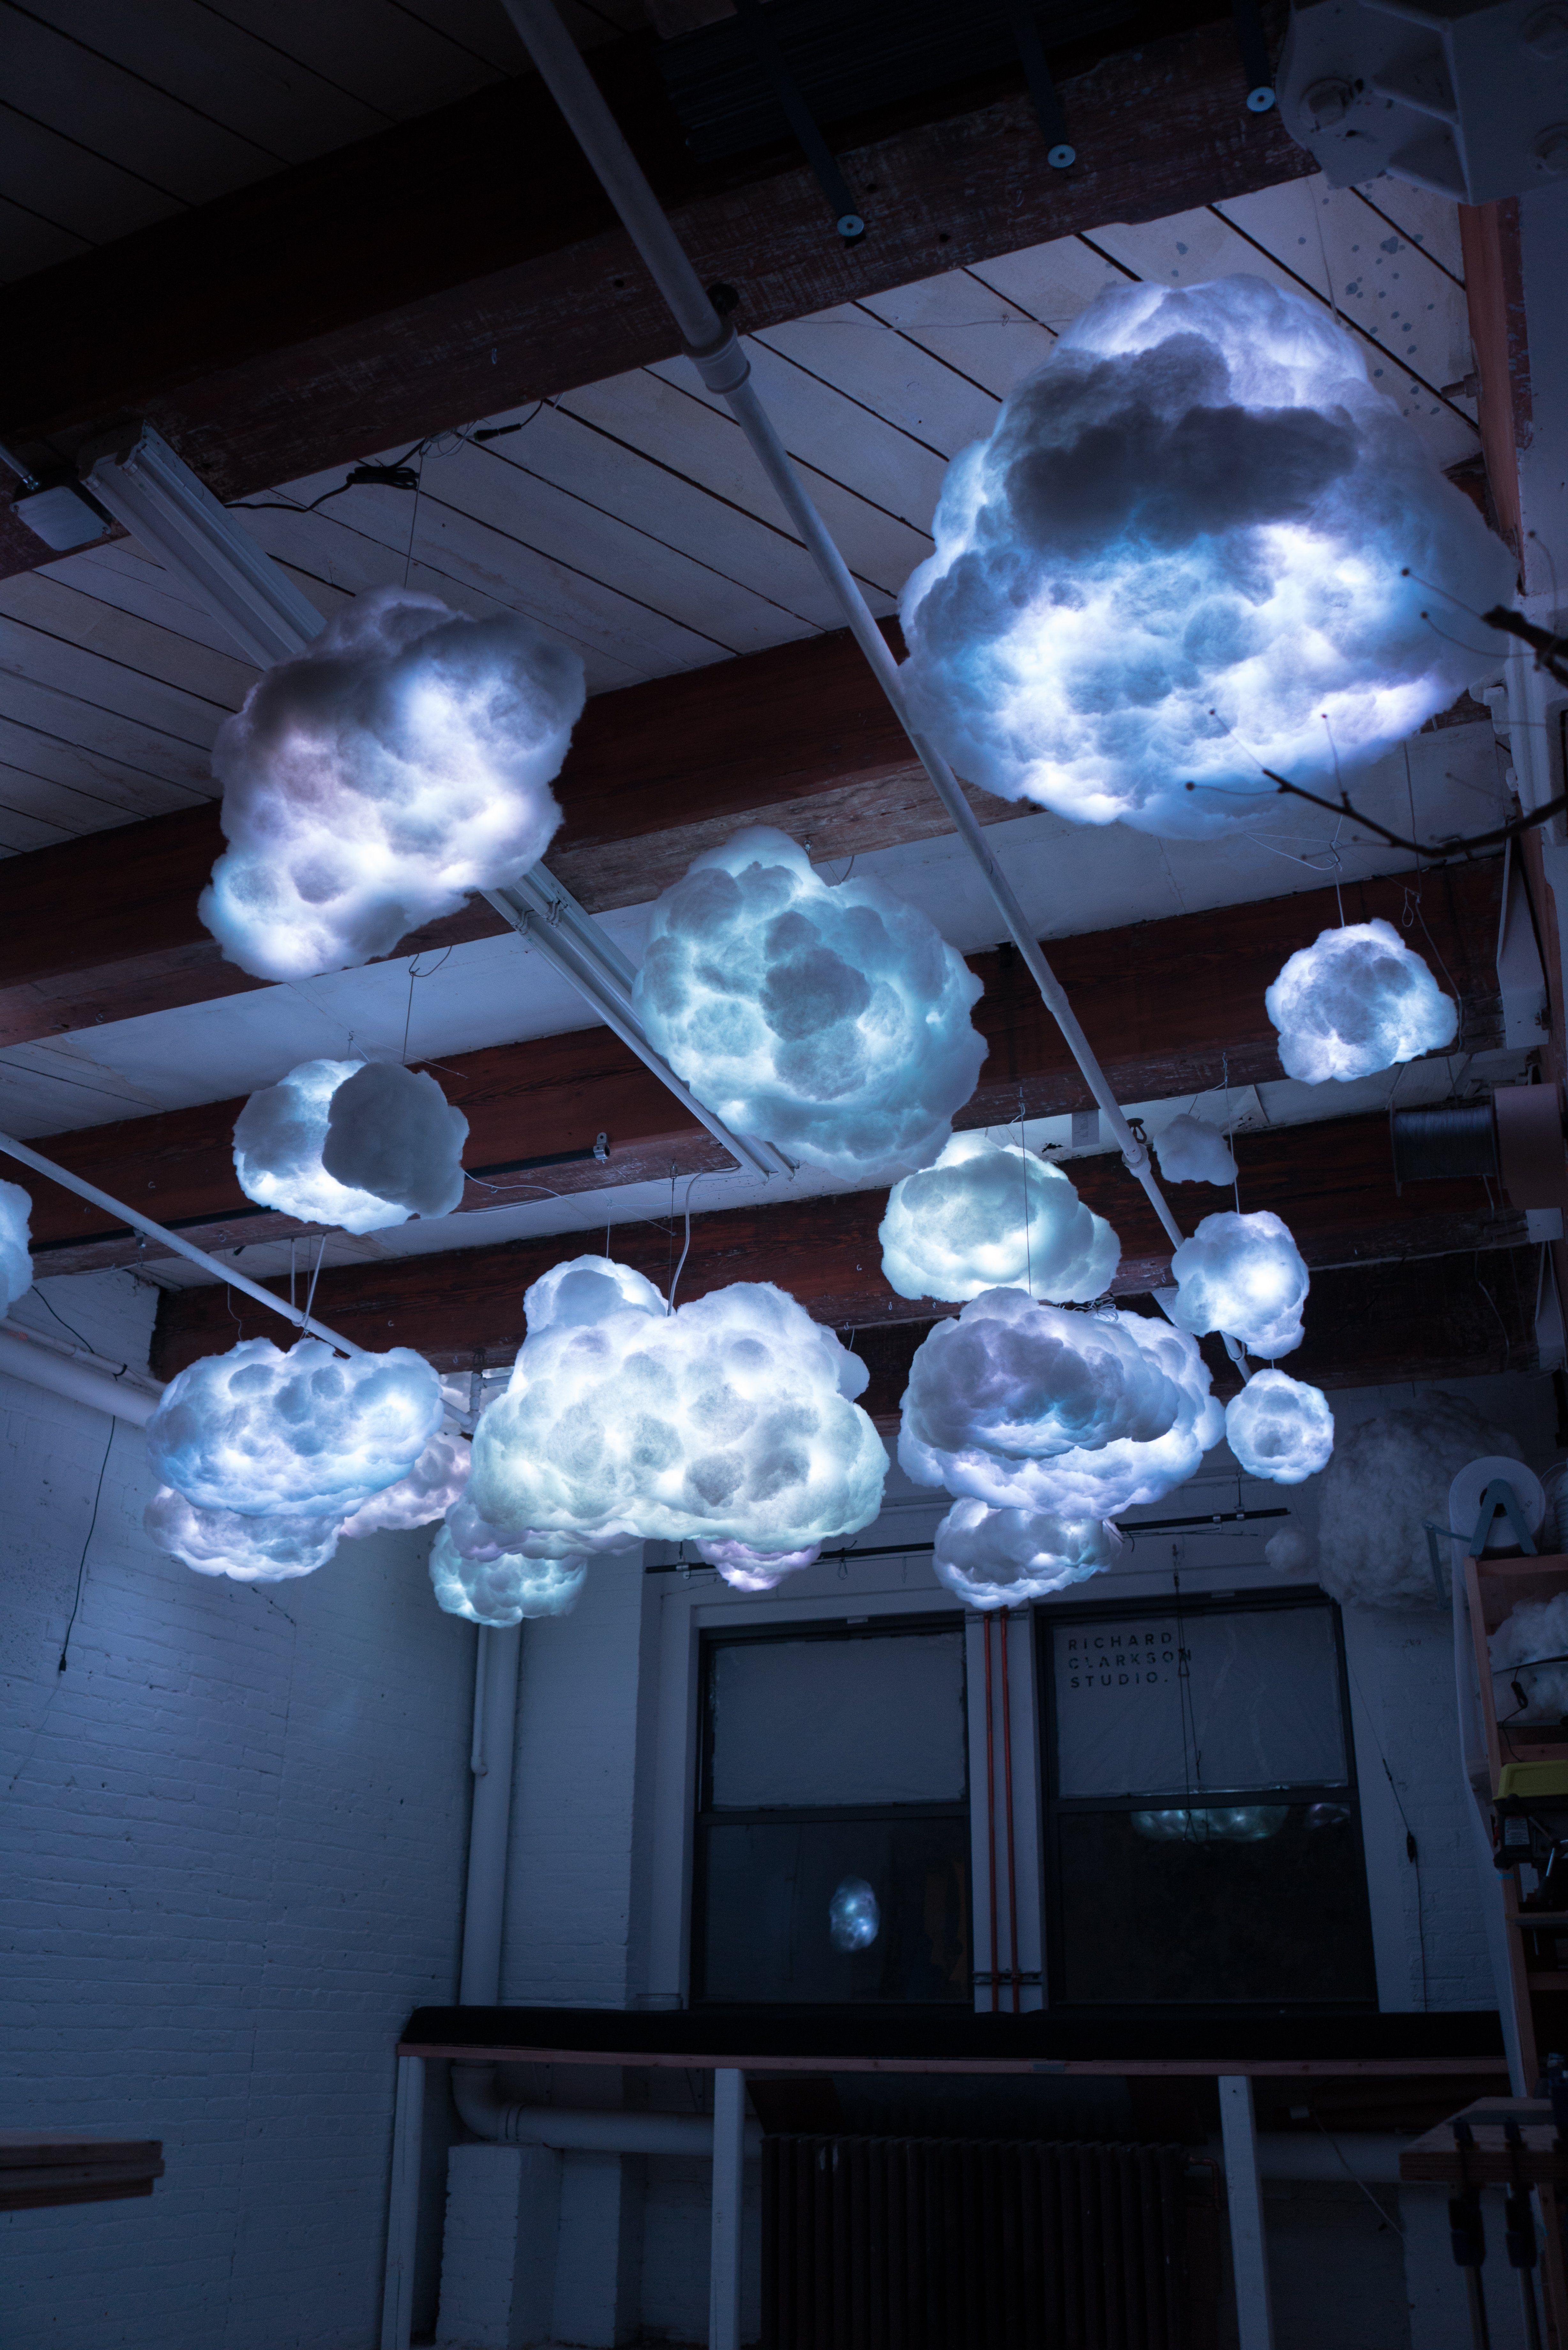 RGB Cloud Lamp in 2020 Cloud lamp diy, Cloud lamp, Cloud